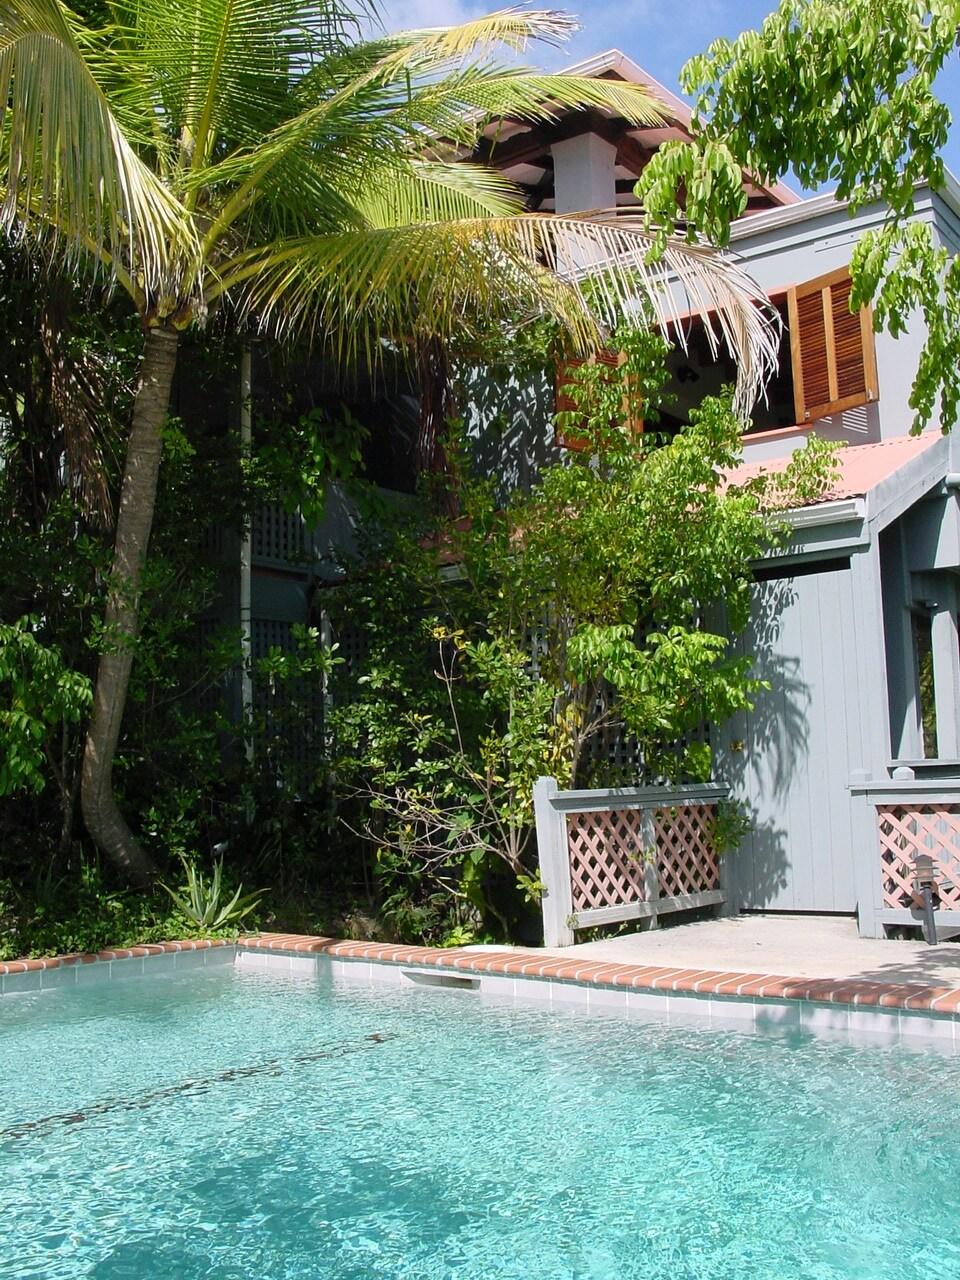 Petit Tre'sor: Best Caribbean Value